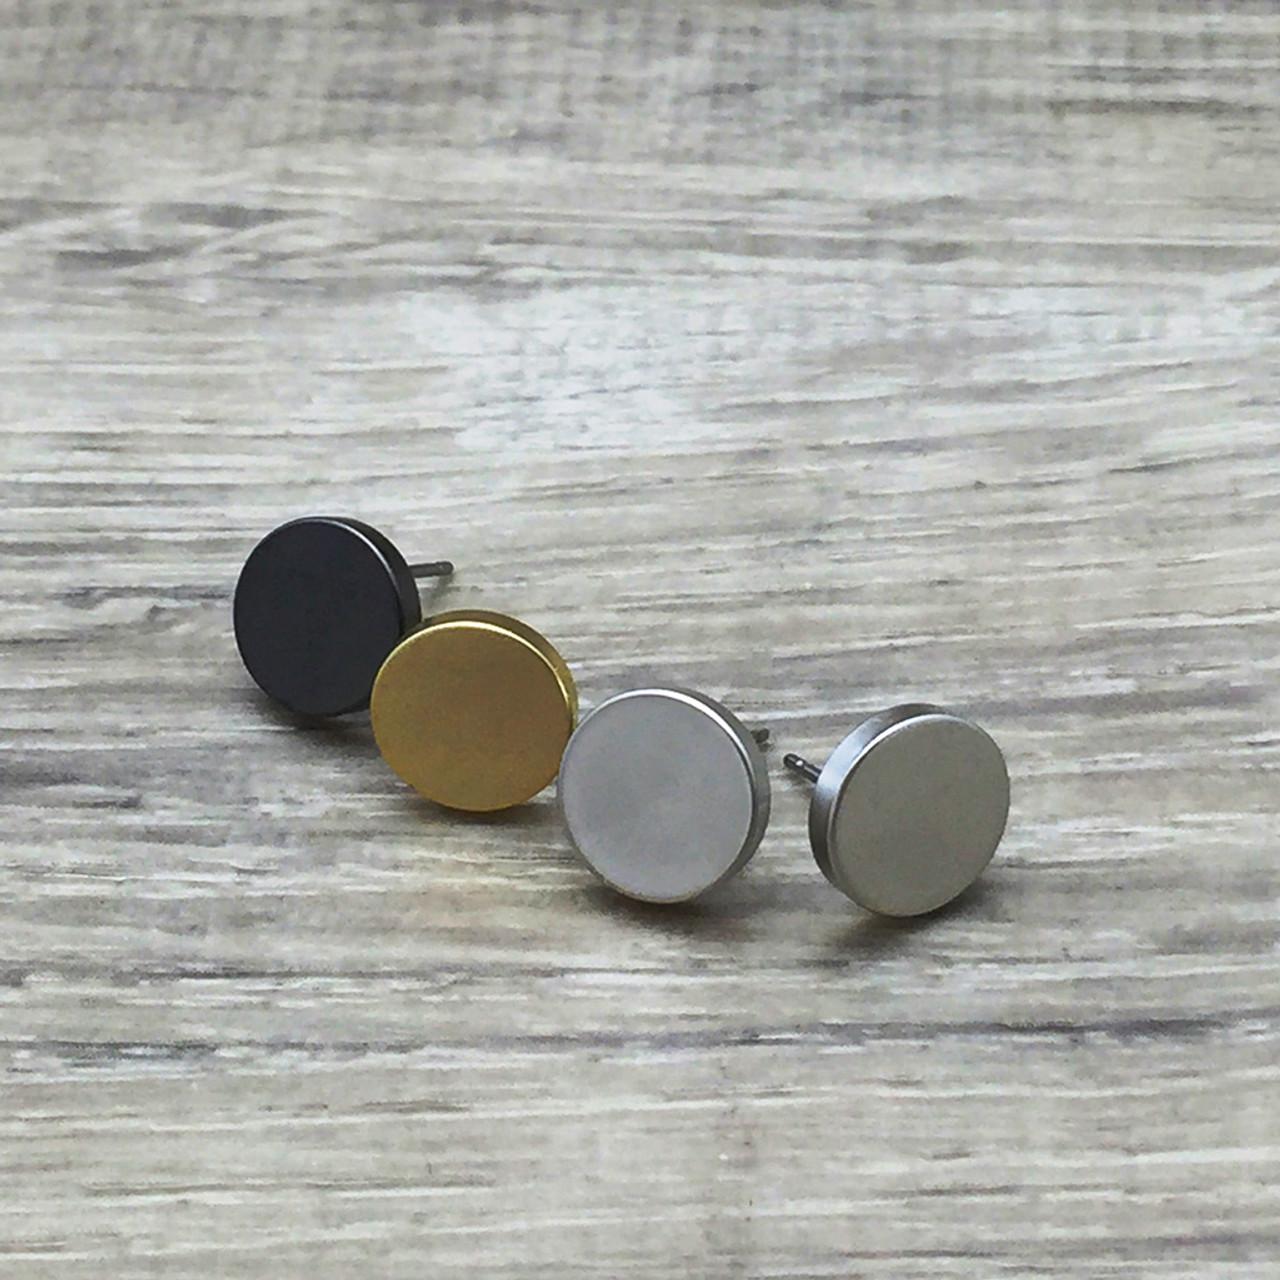 8cd35098b3fa Circle stud earring - FAB Accessories Inc.